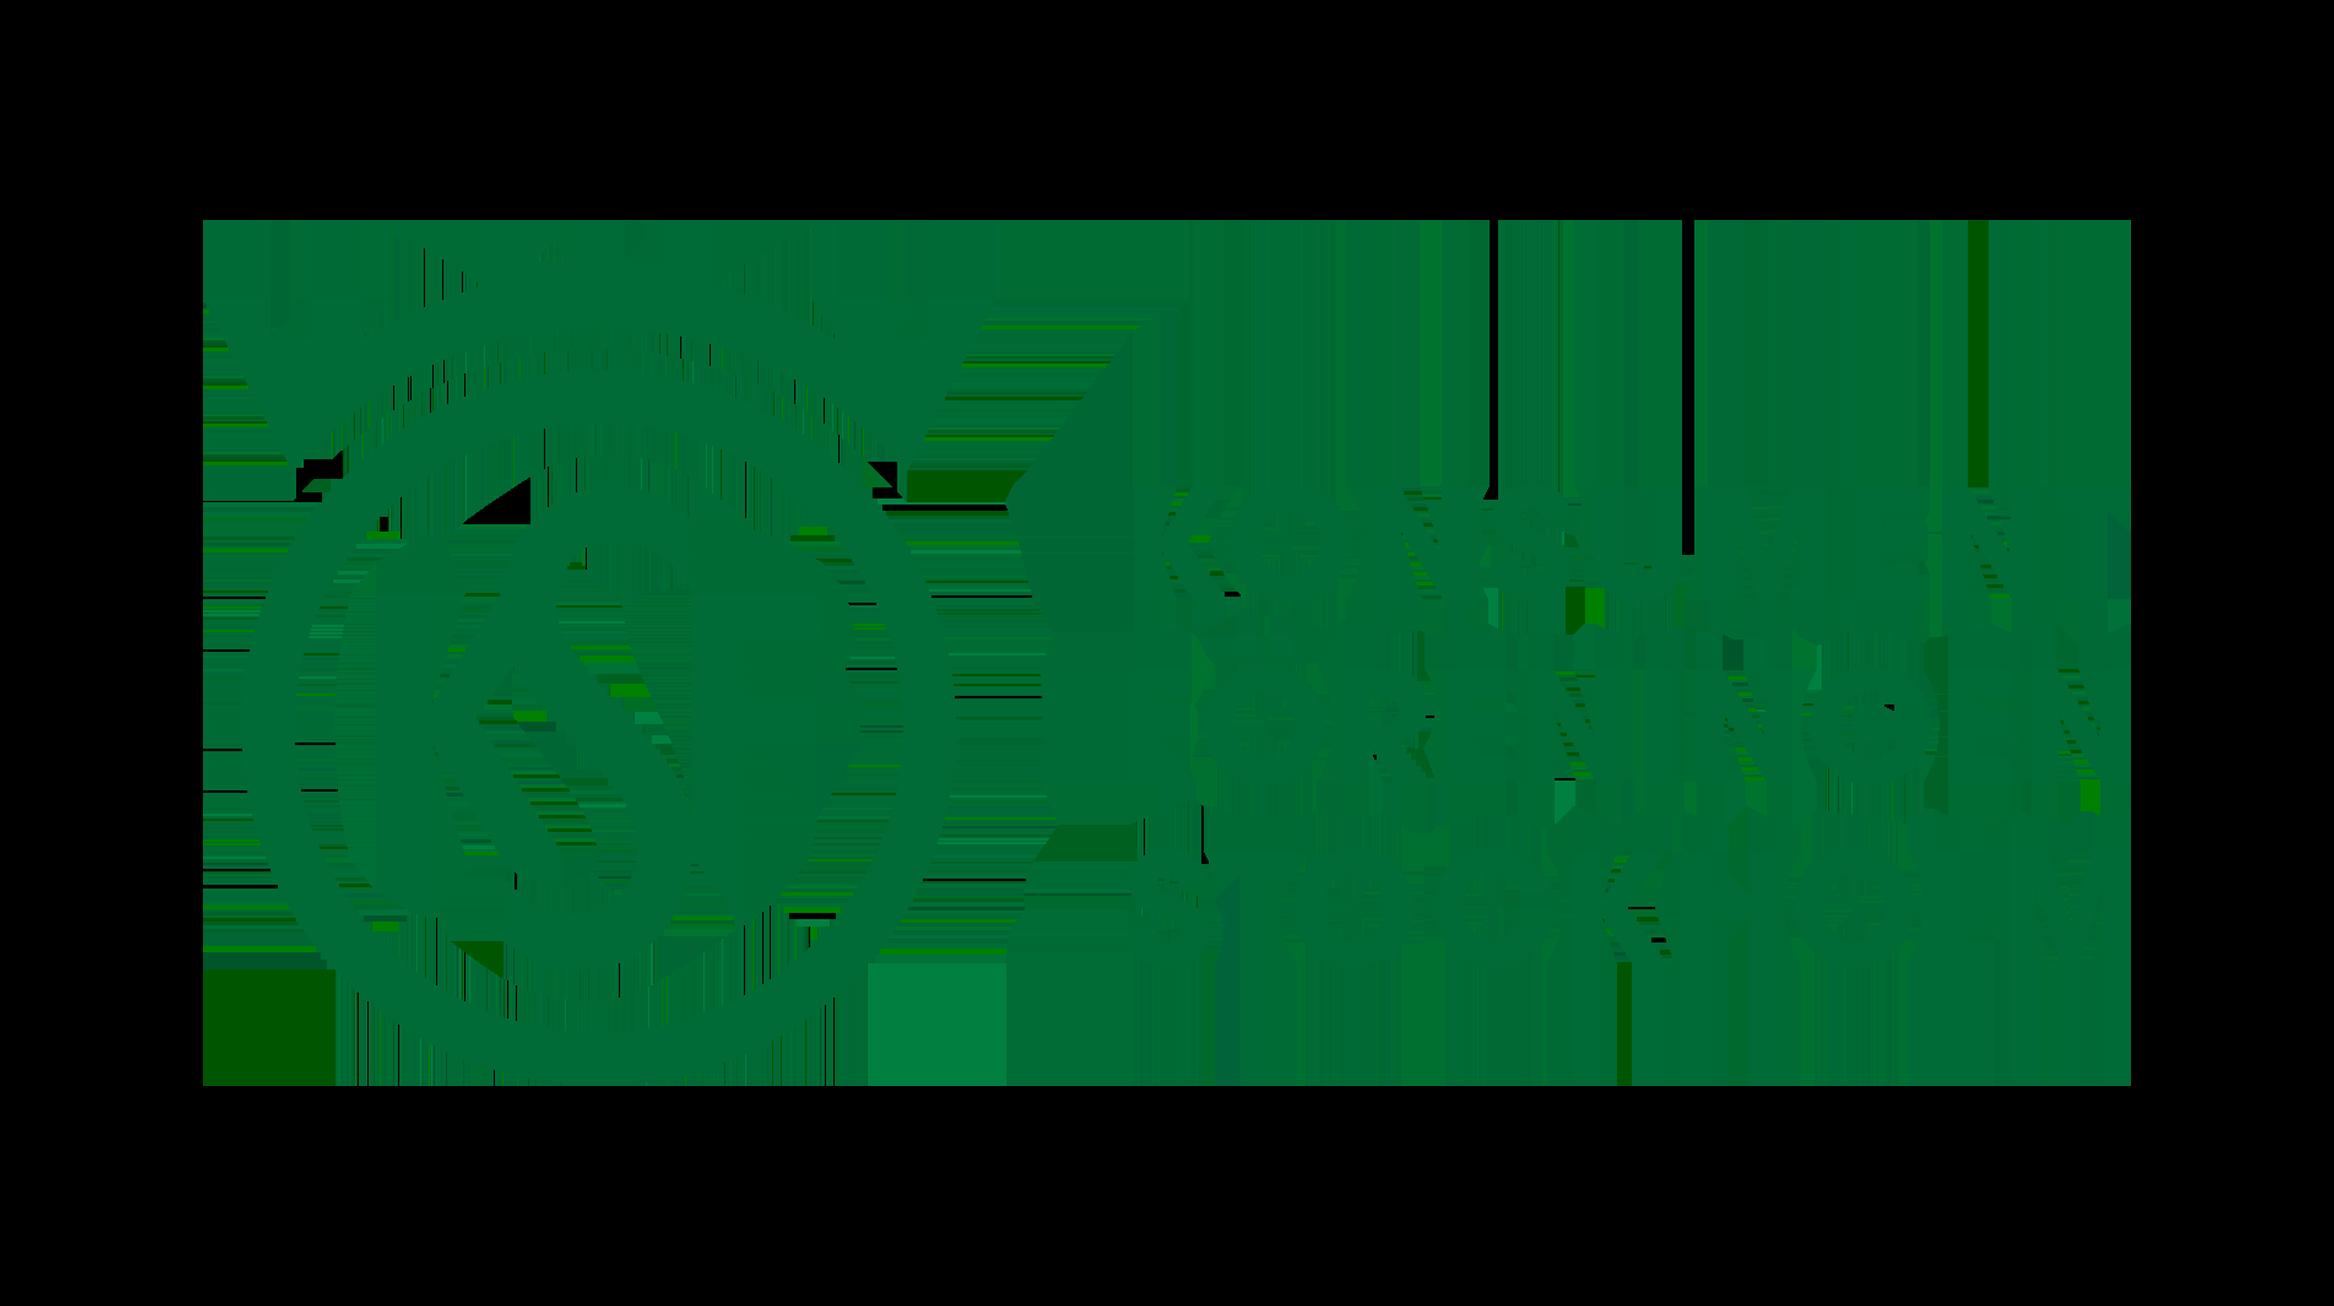 logos_konsumentforeningen